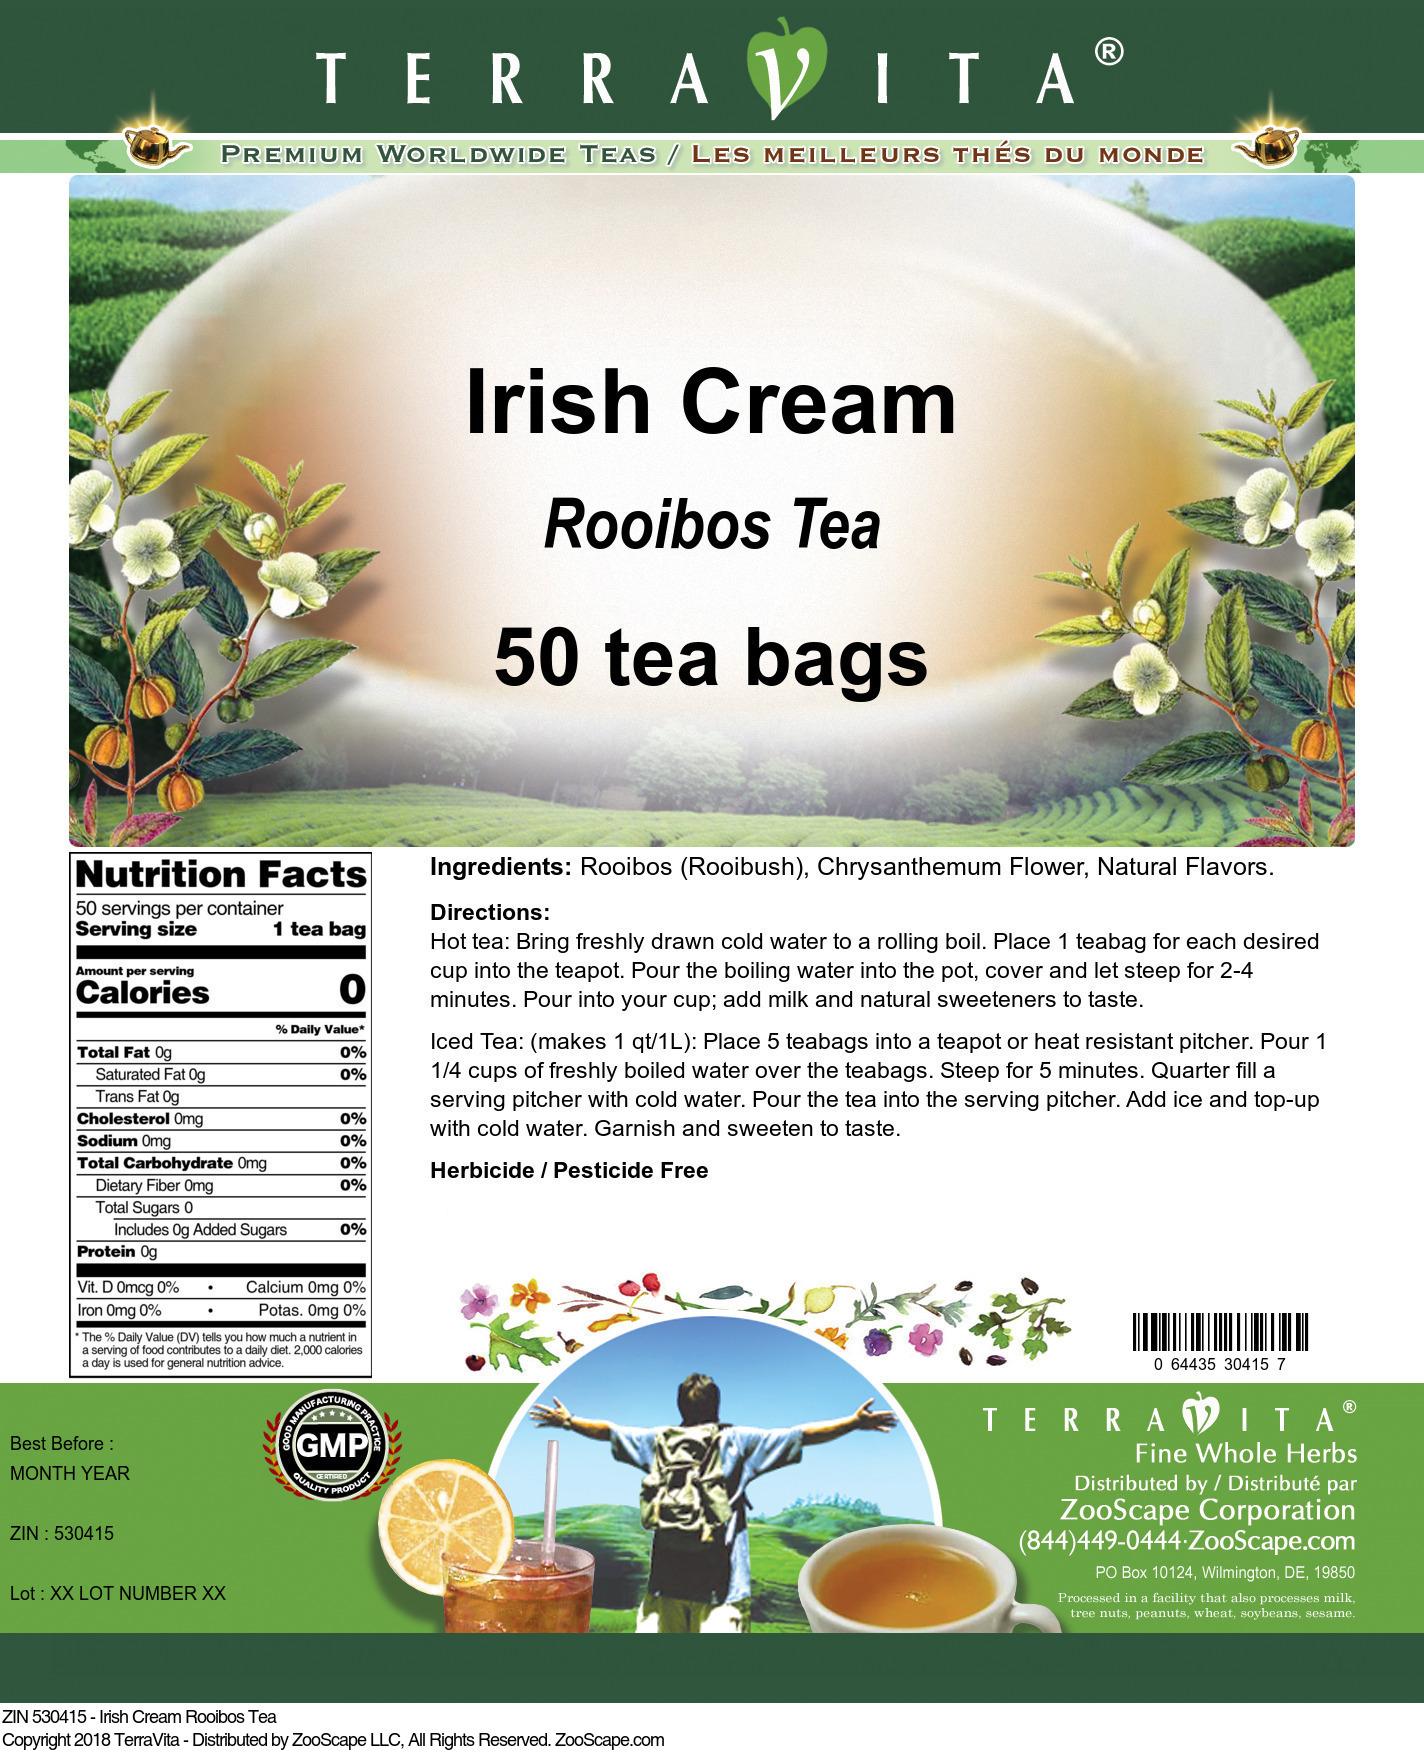 Irish Cream Rooibos Tea